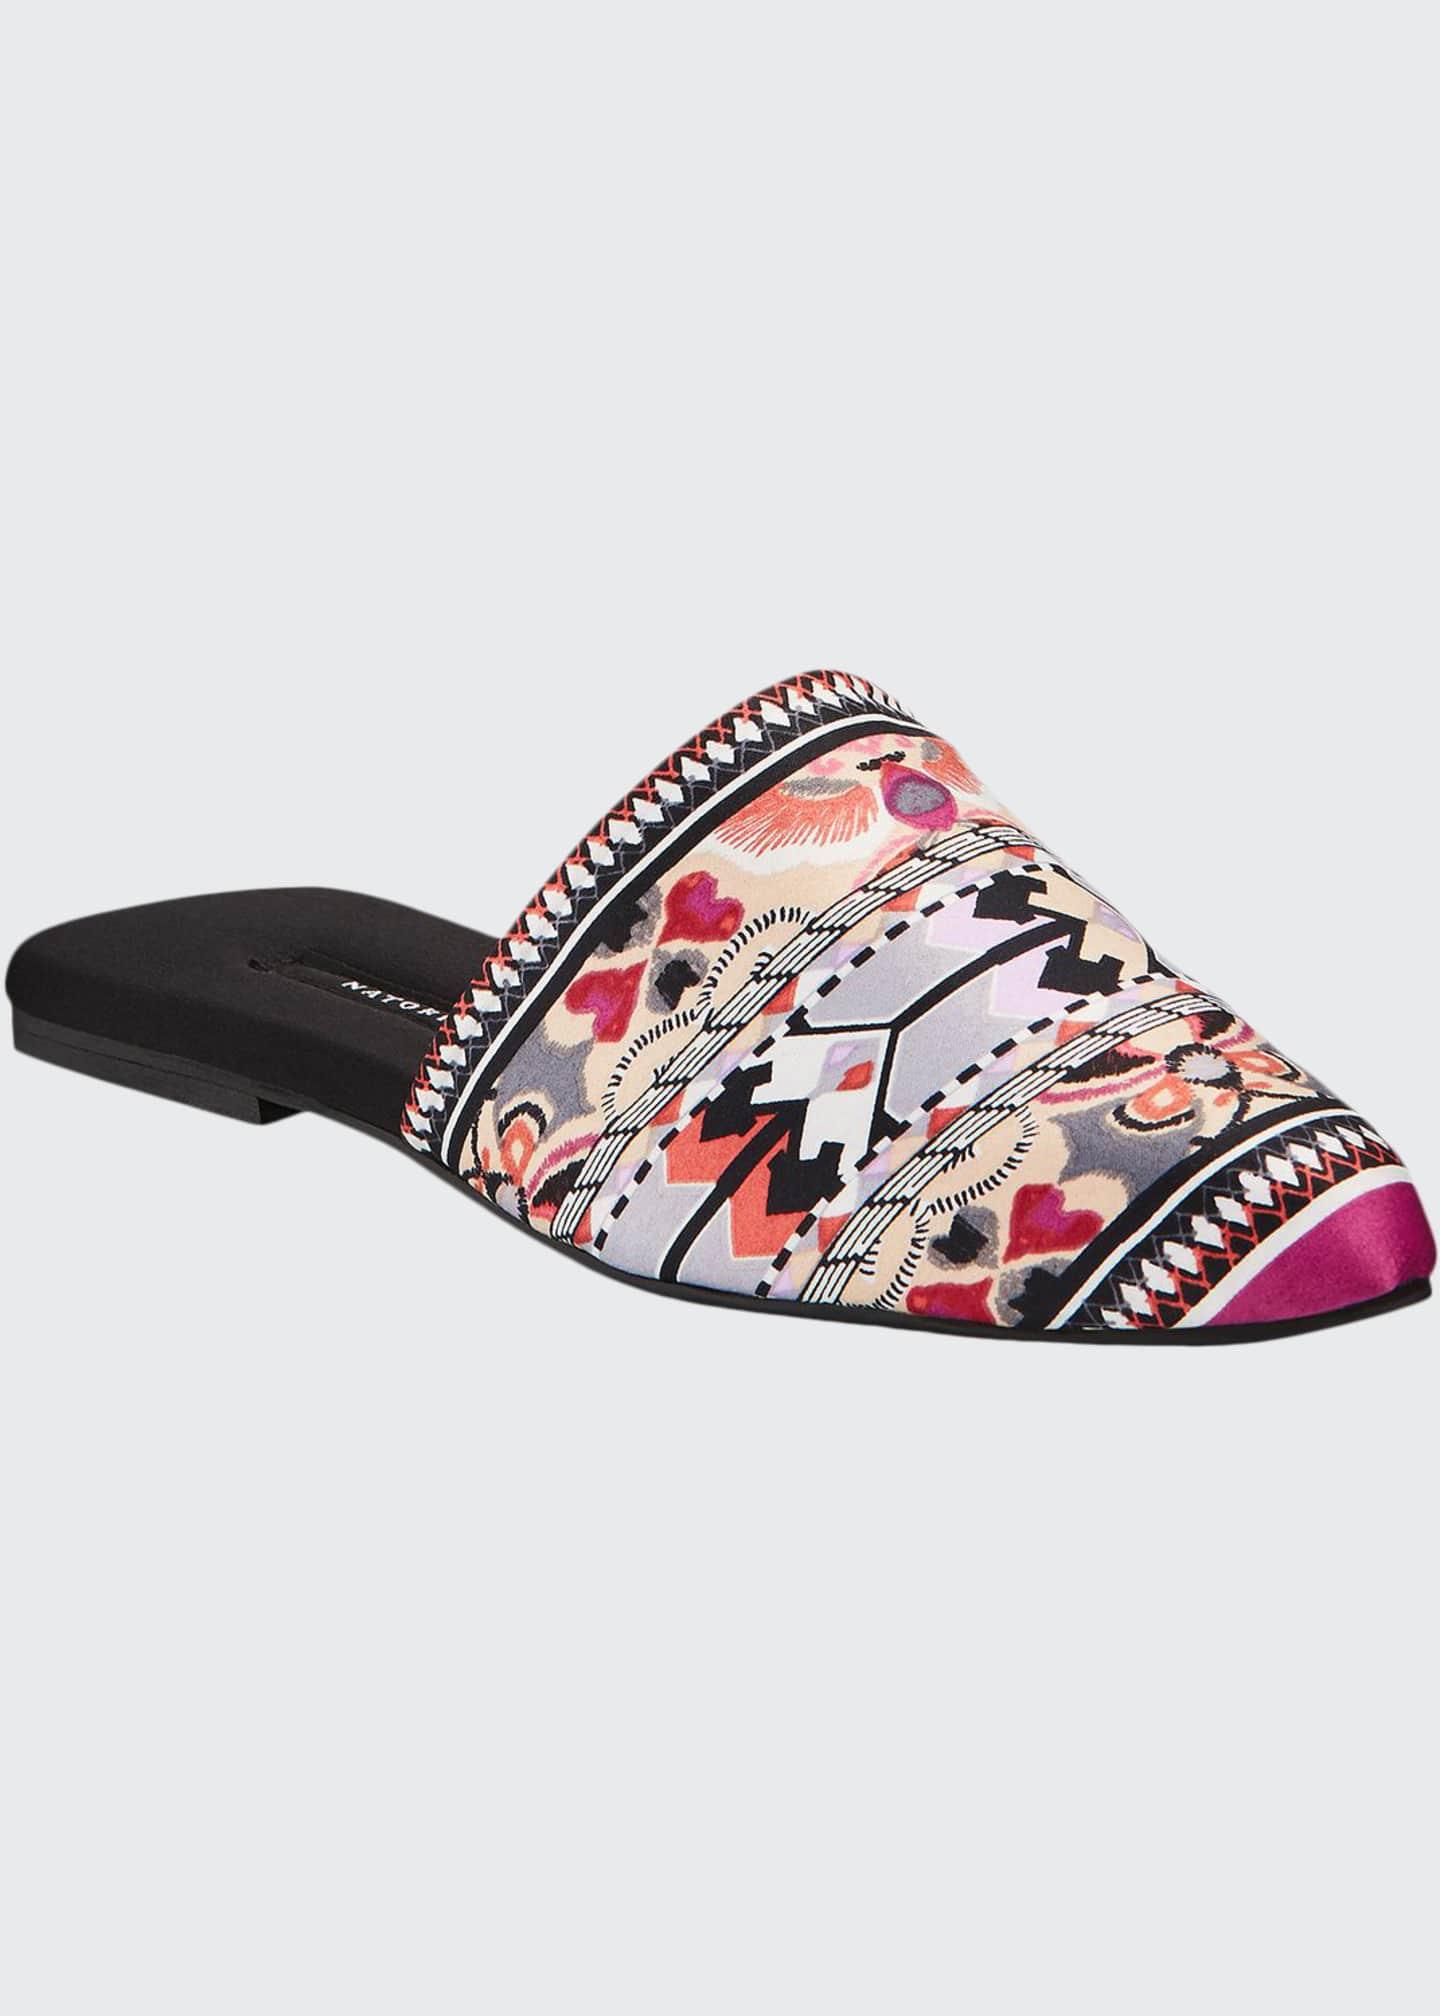 Natori Fusion Printed Satin Mule Slippers